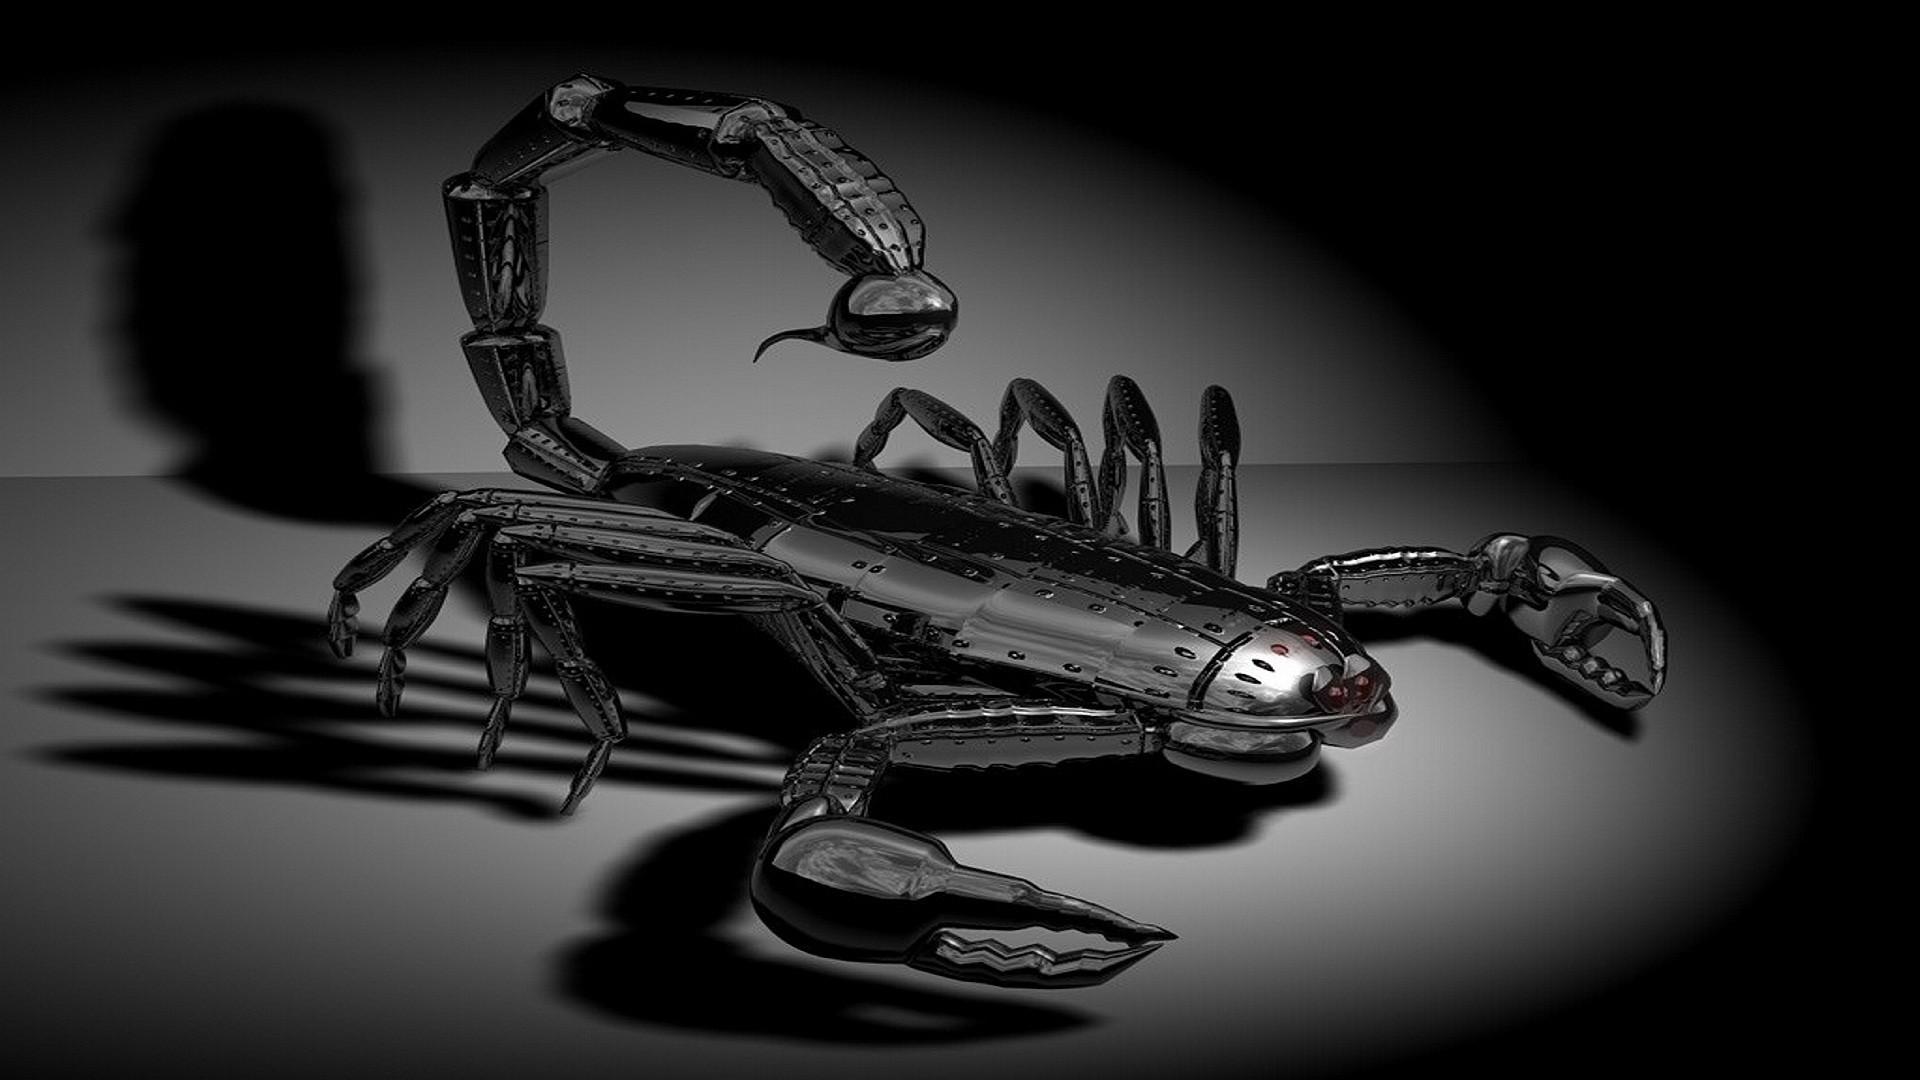 com mediawallpapers 1920x108012meal scorpion 12114jpg 1920x1080